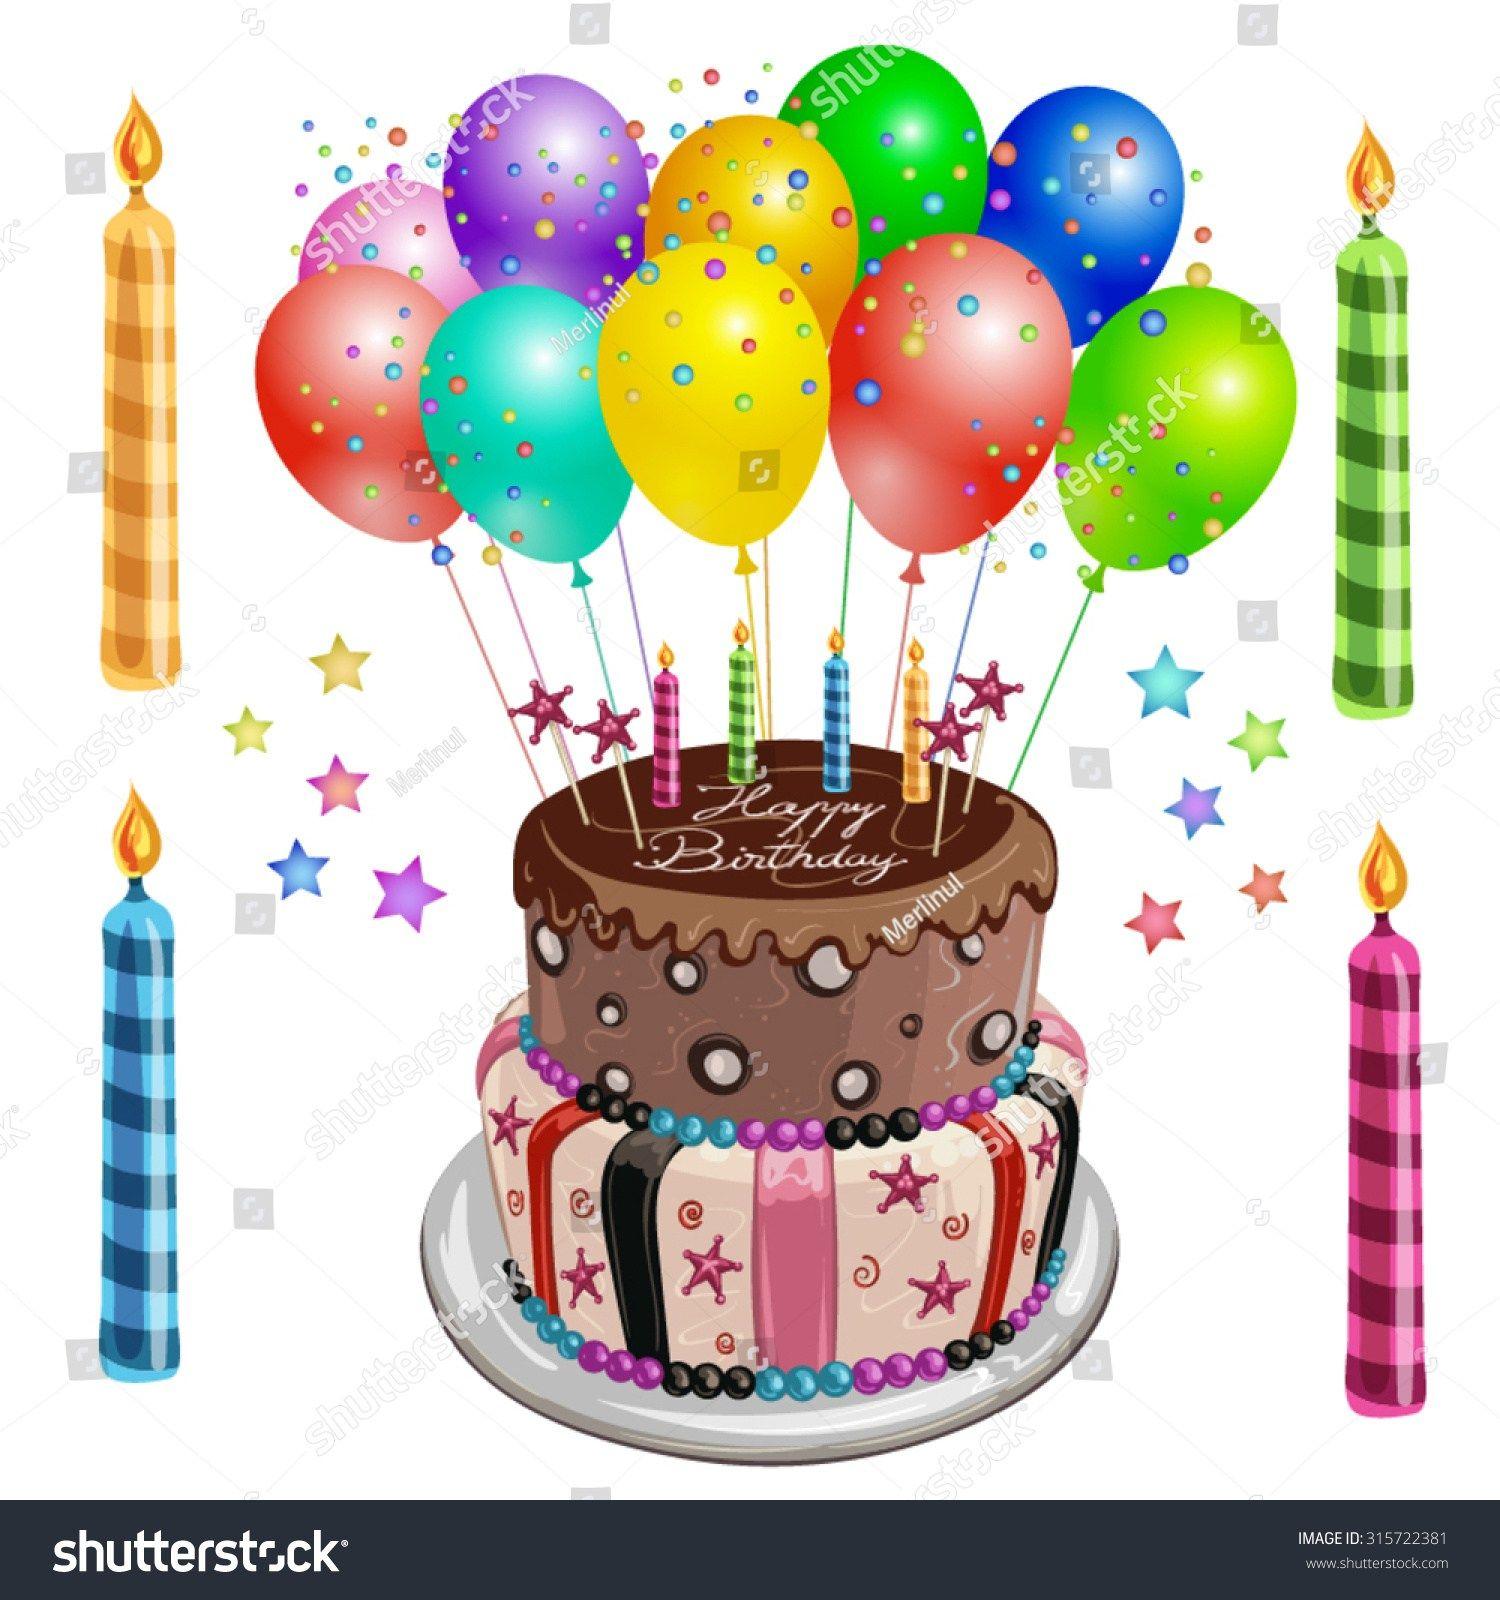 30 Elegant Photo Of Birthday Cake And Balloons Birijus Com Birthday Cake With Photo Balloon Birthday Cakes Birthday Cake